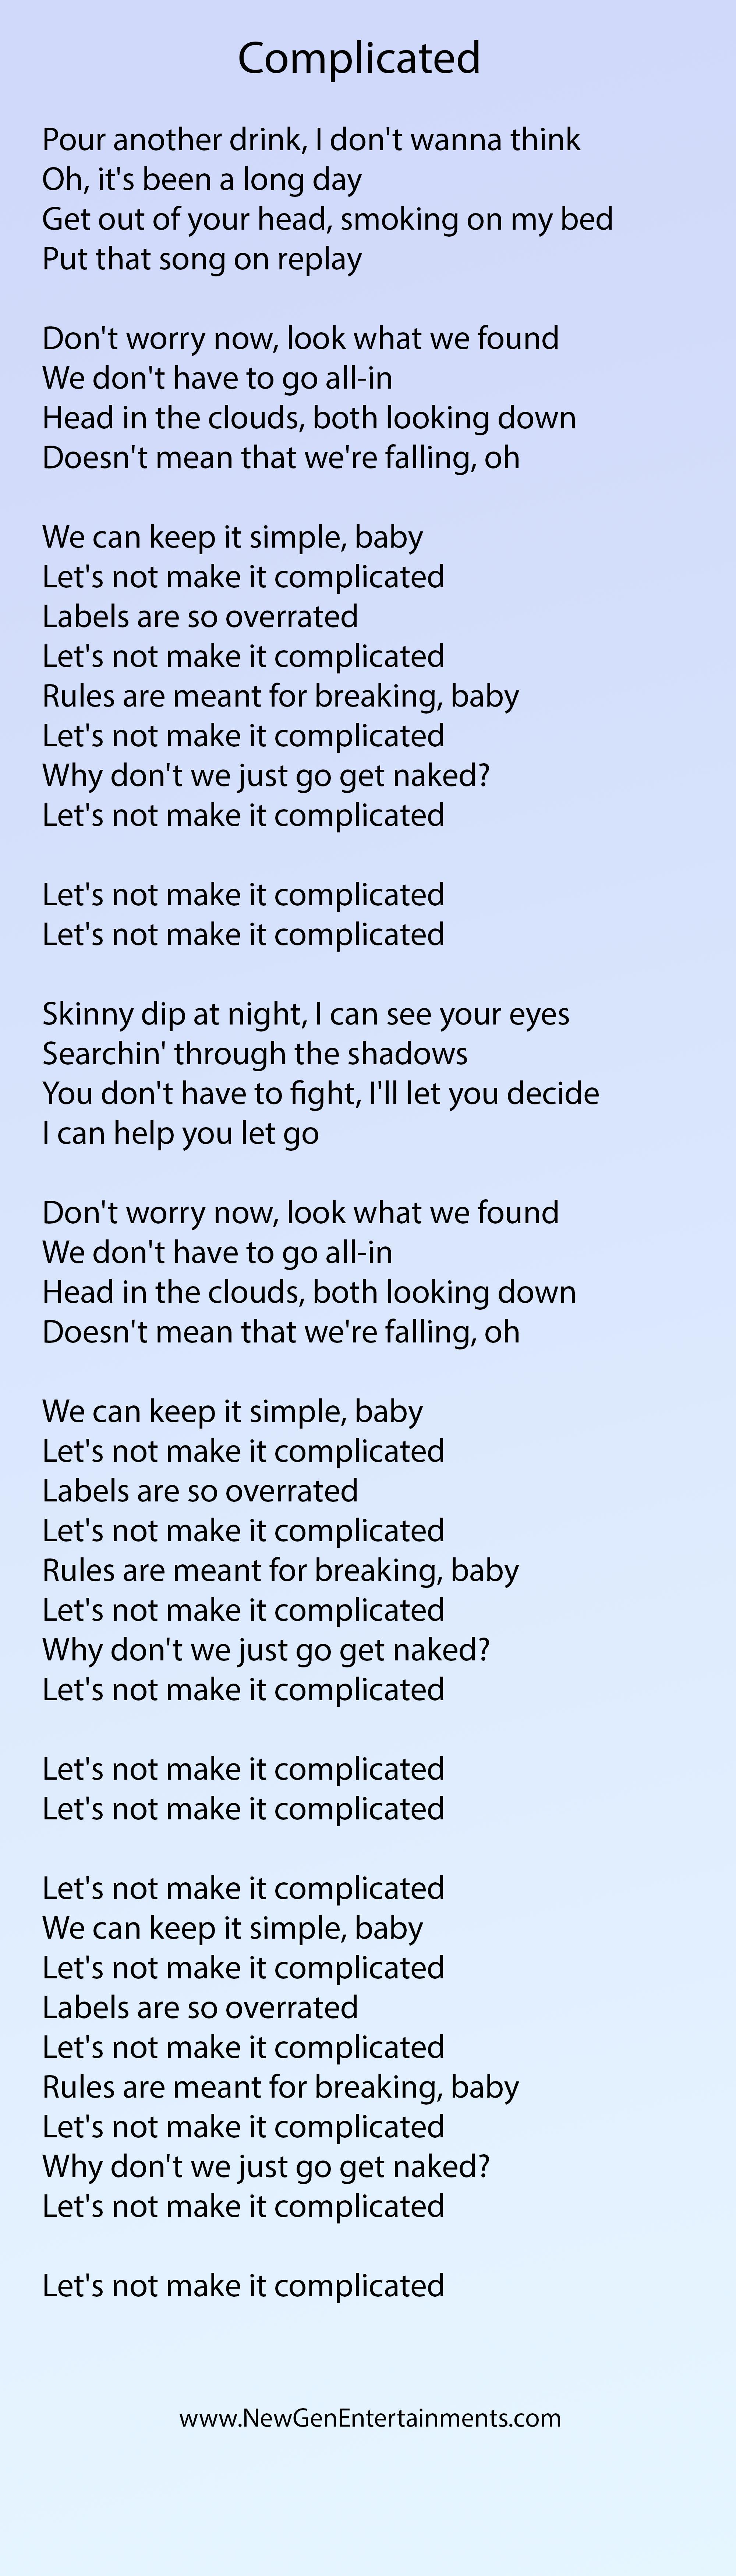 Town just get naked lyrics movies